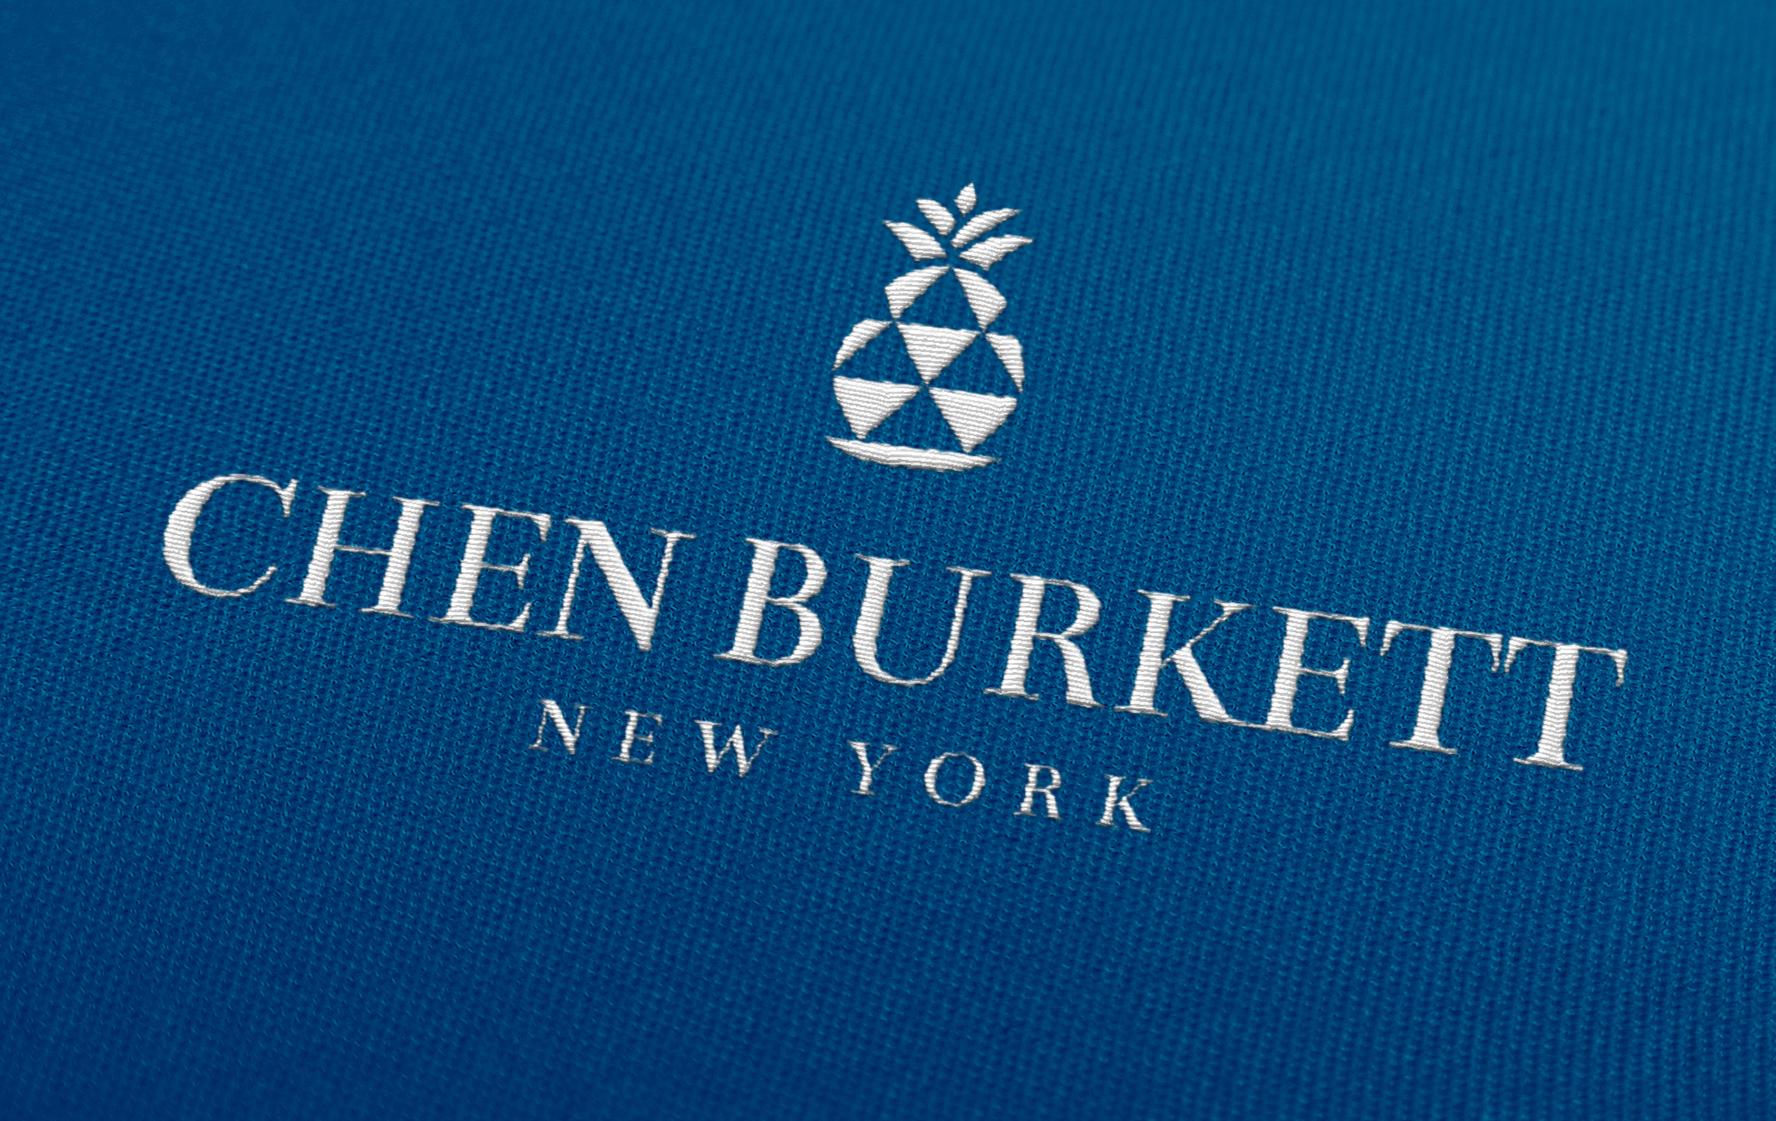 Chen Burkett New York Logo Reverse